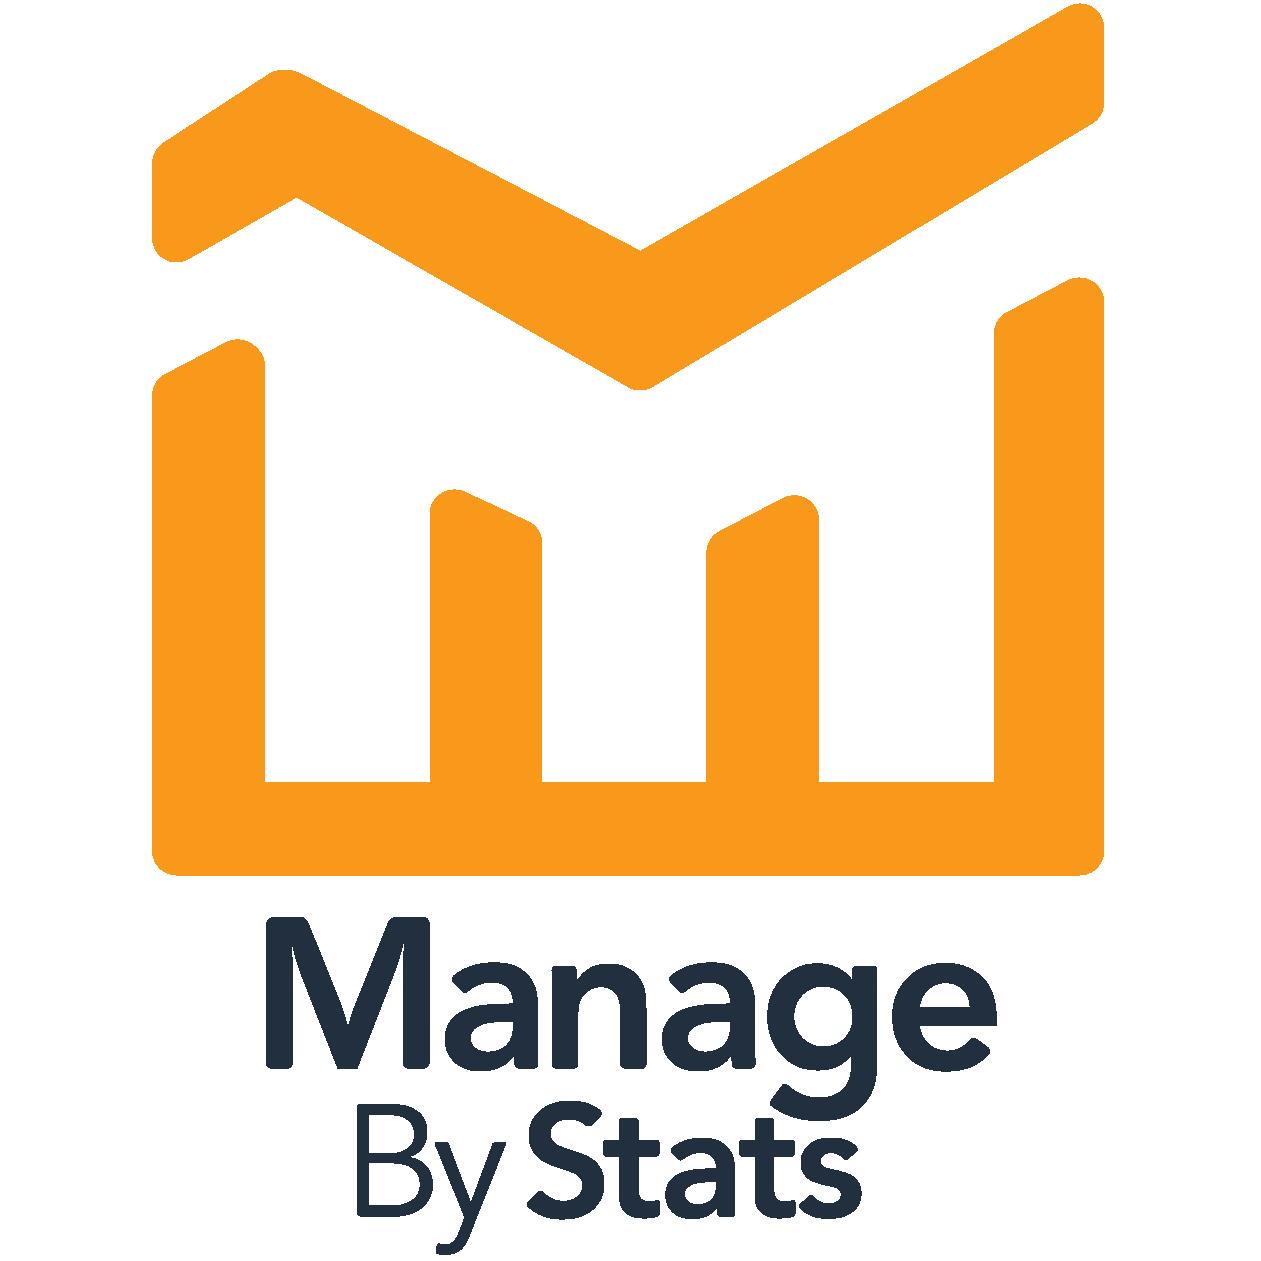 ManageByStats.com